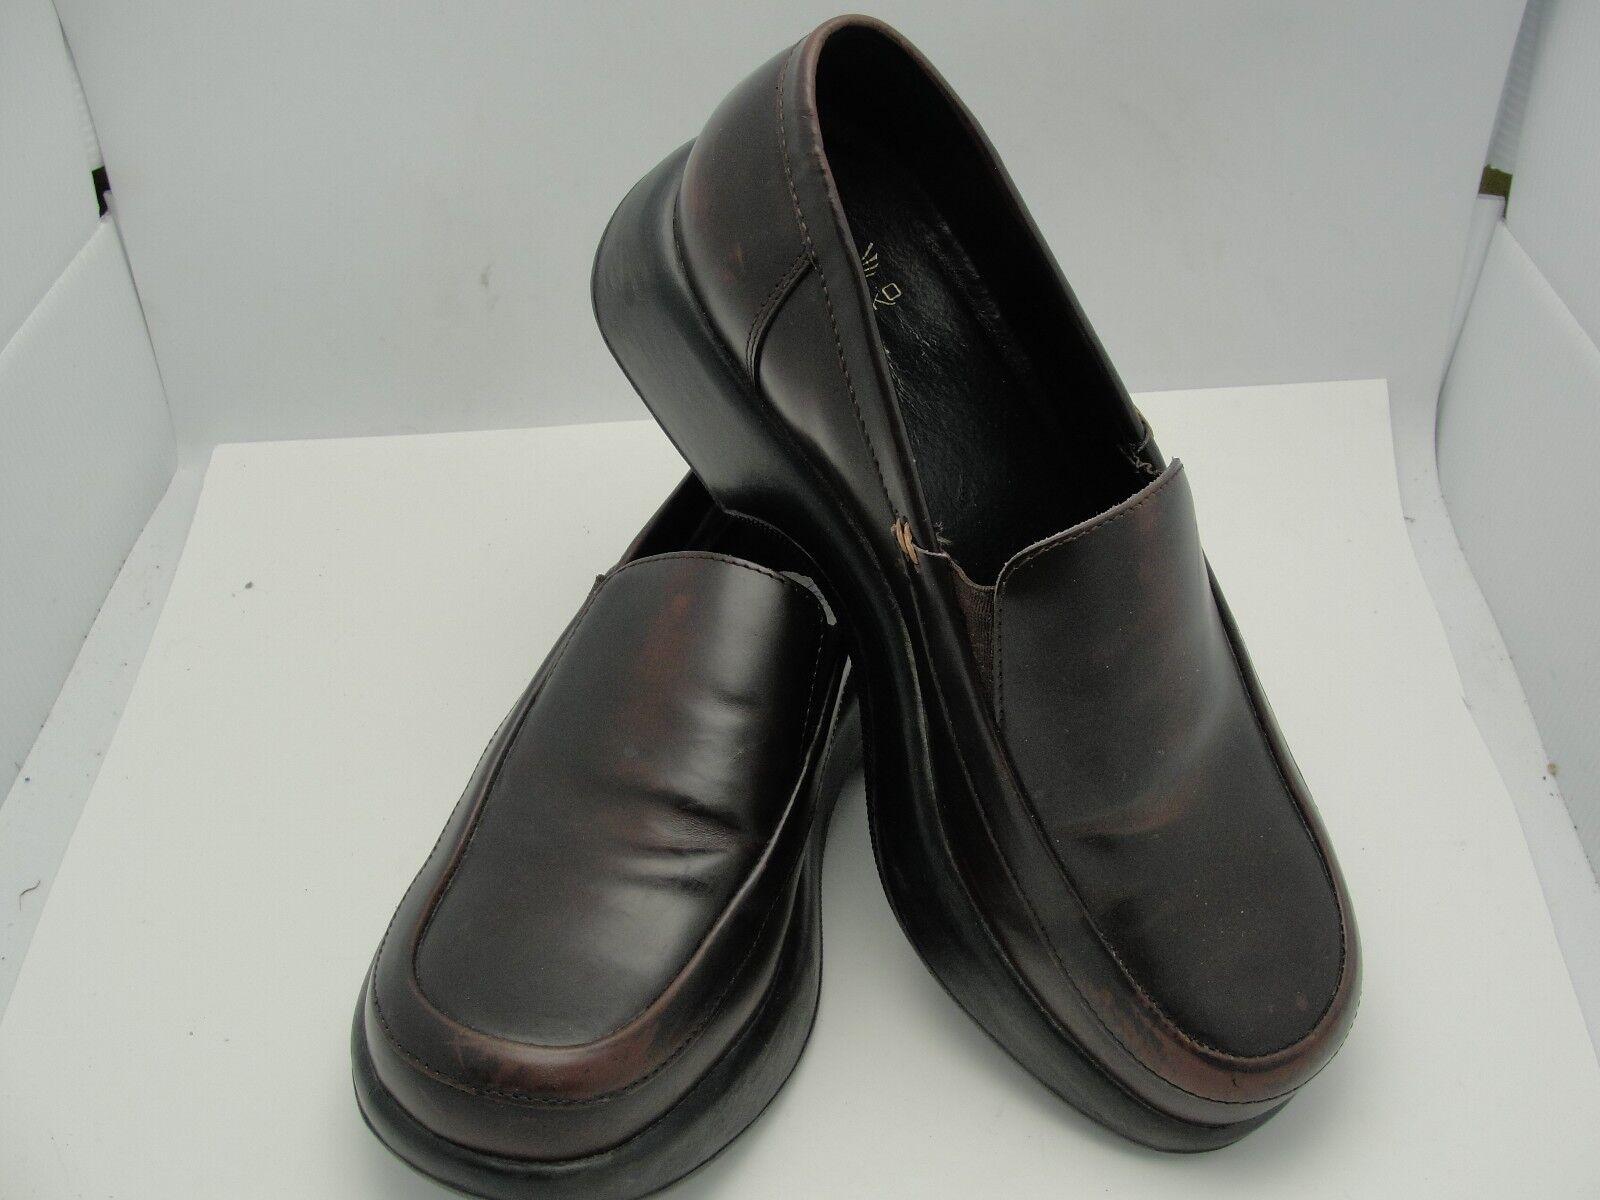 DANSKO Women's Dark Brown Leather Slip On Loafers Clogs shoes Size 9.5-10